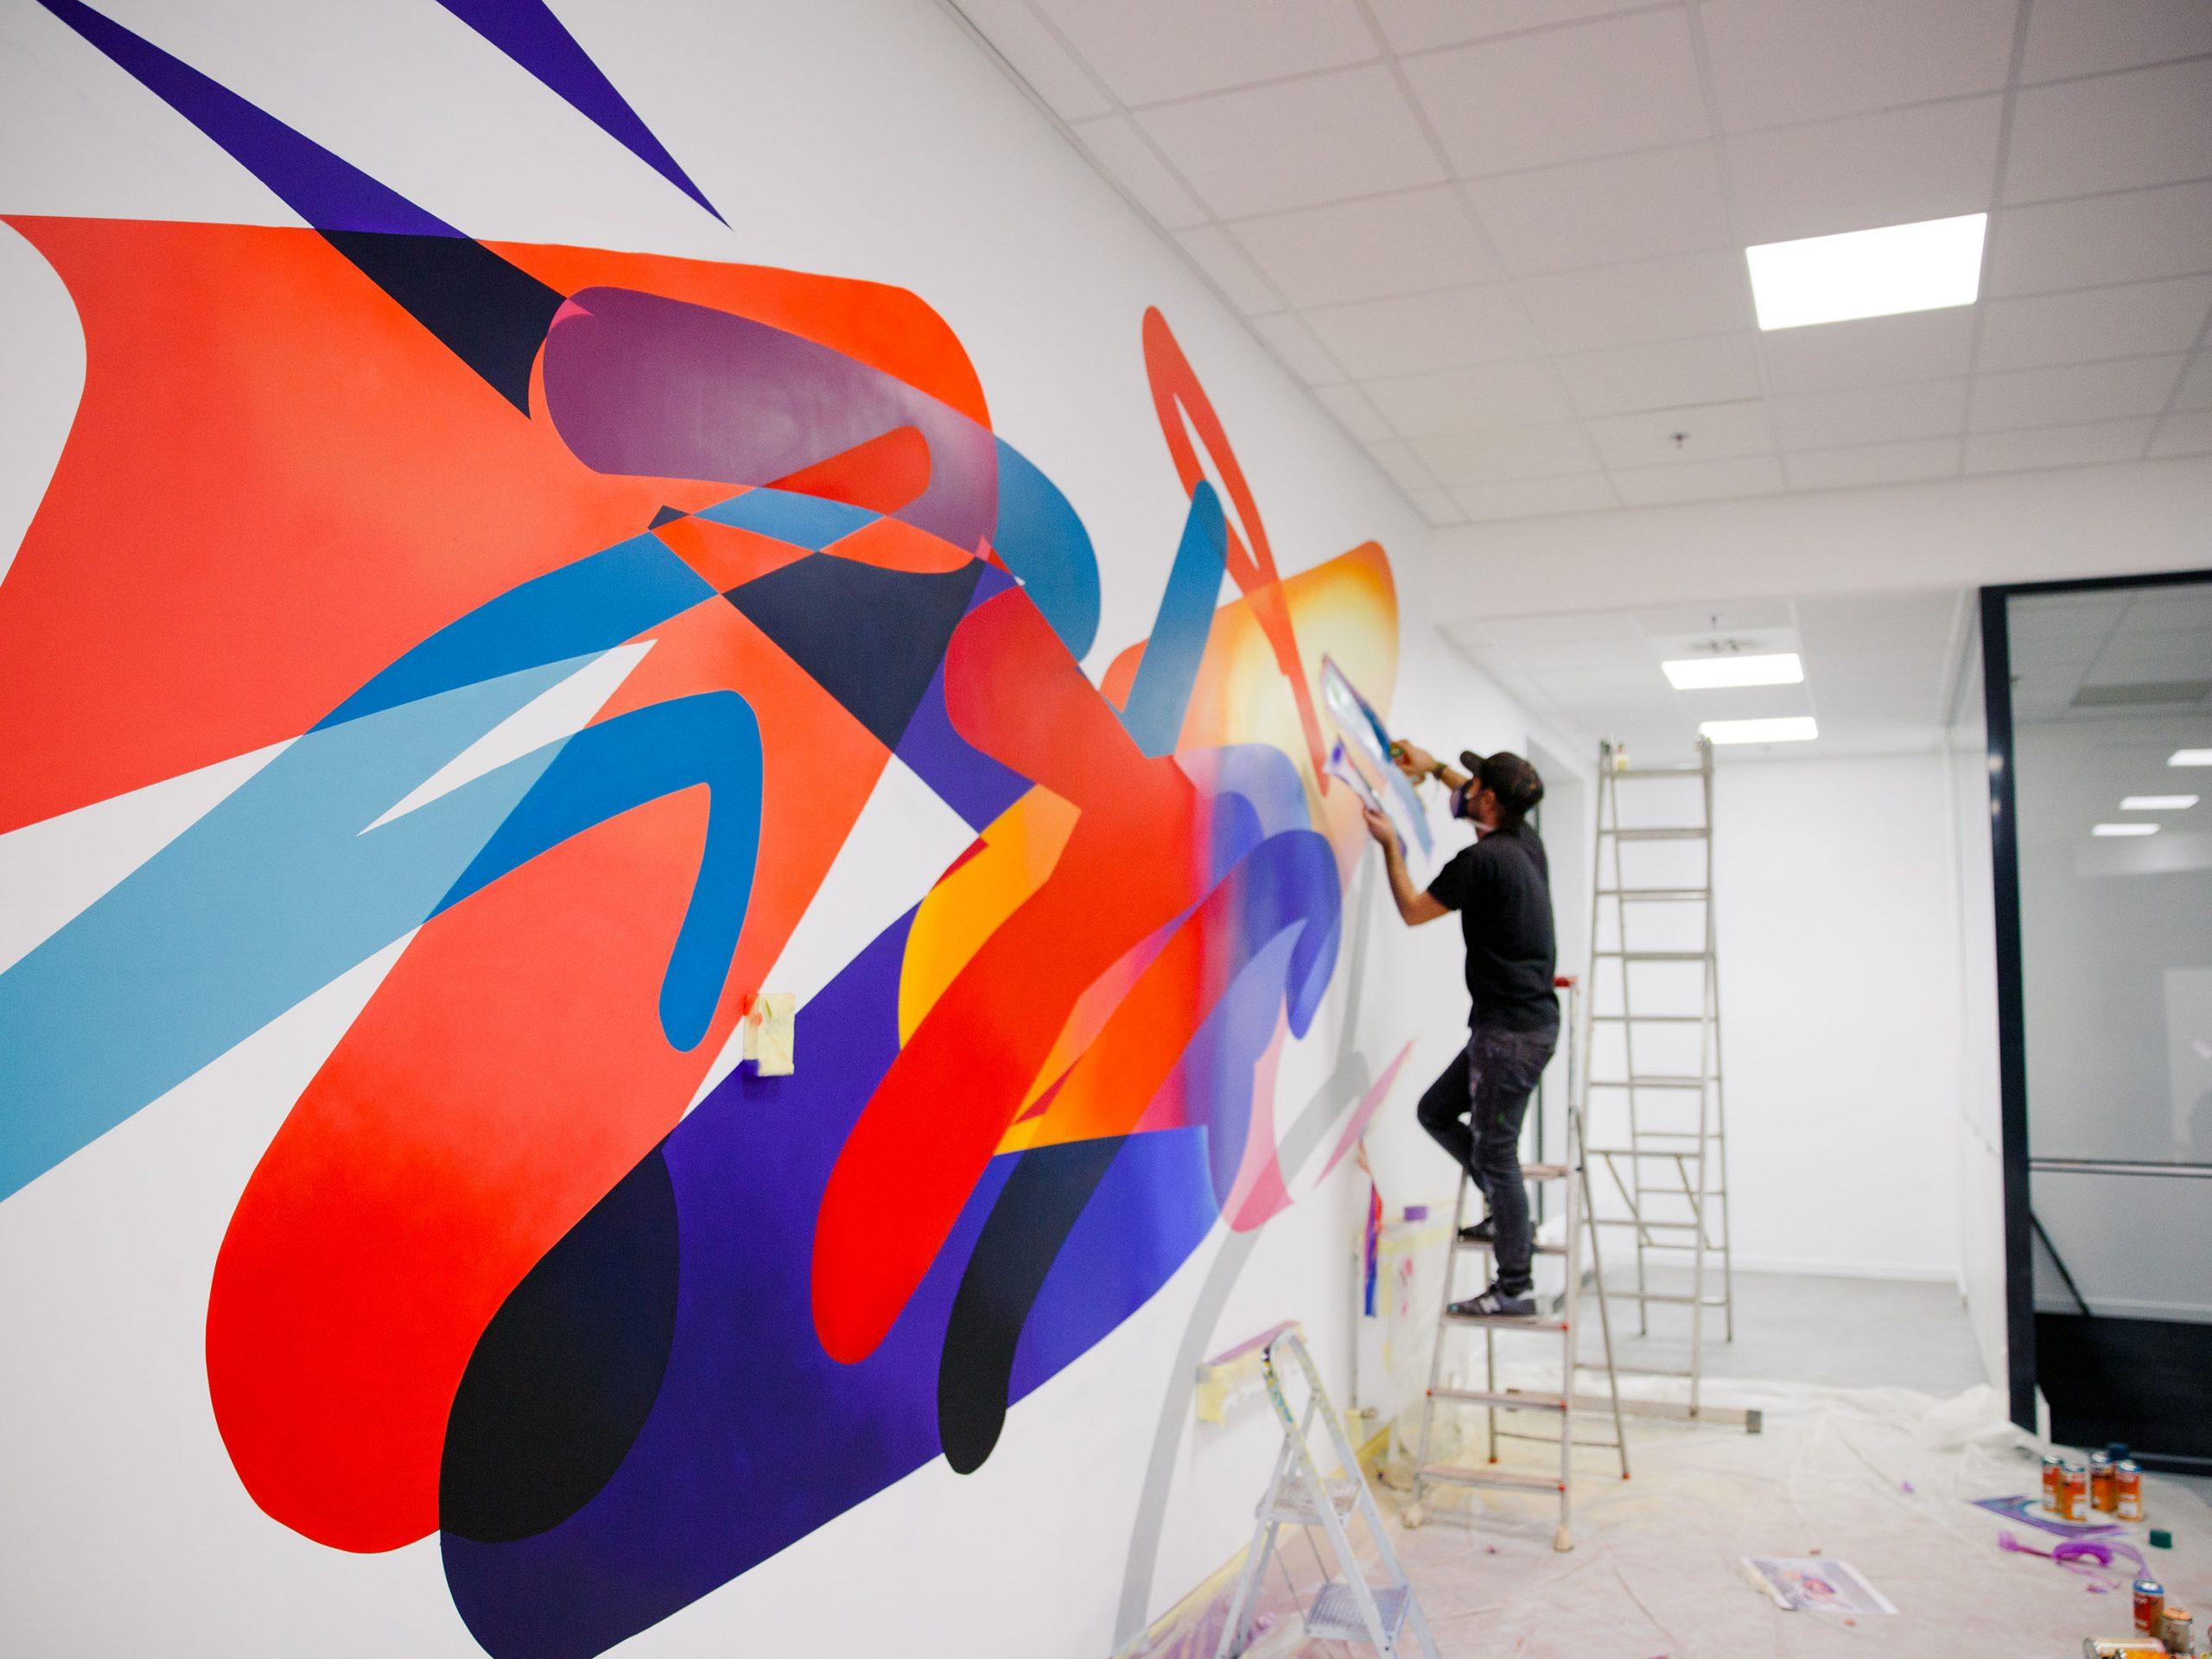 action-painting-graffiti-fresque-halltimes-graffeur-toulouse-lagencedecomm